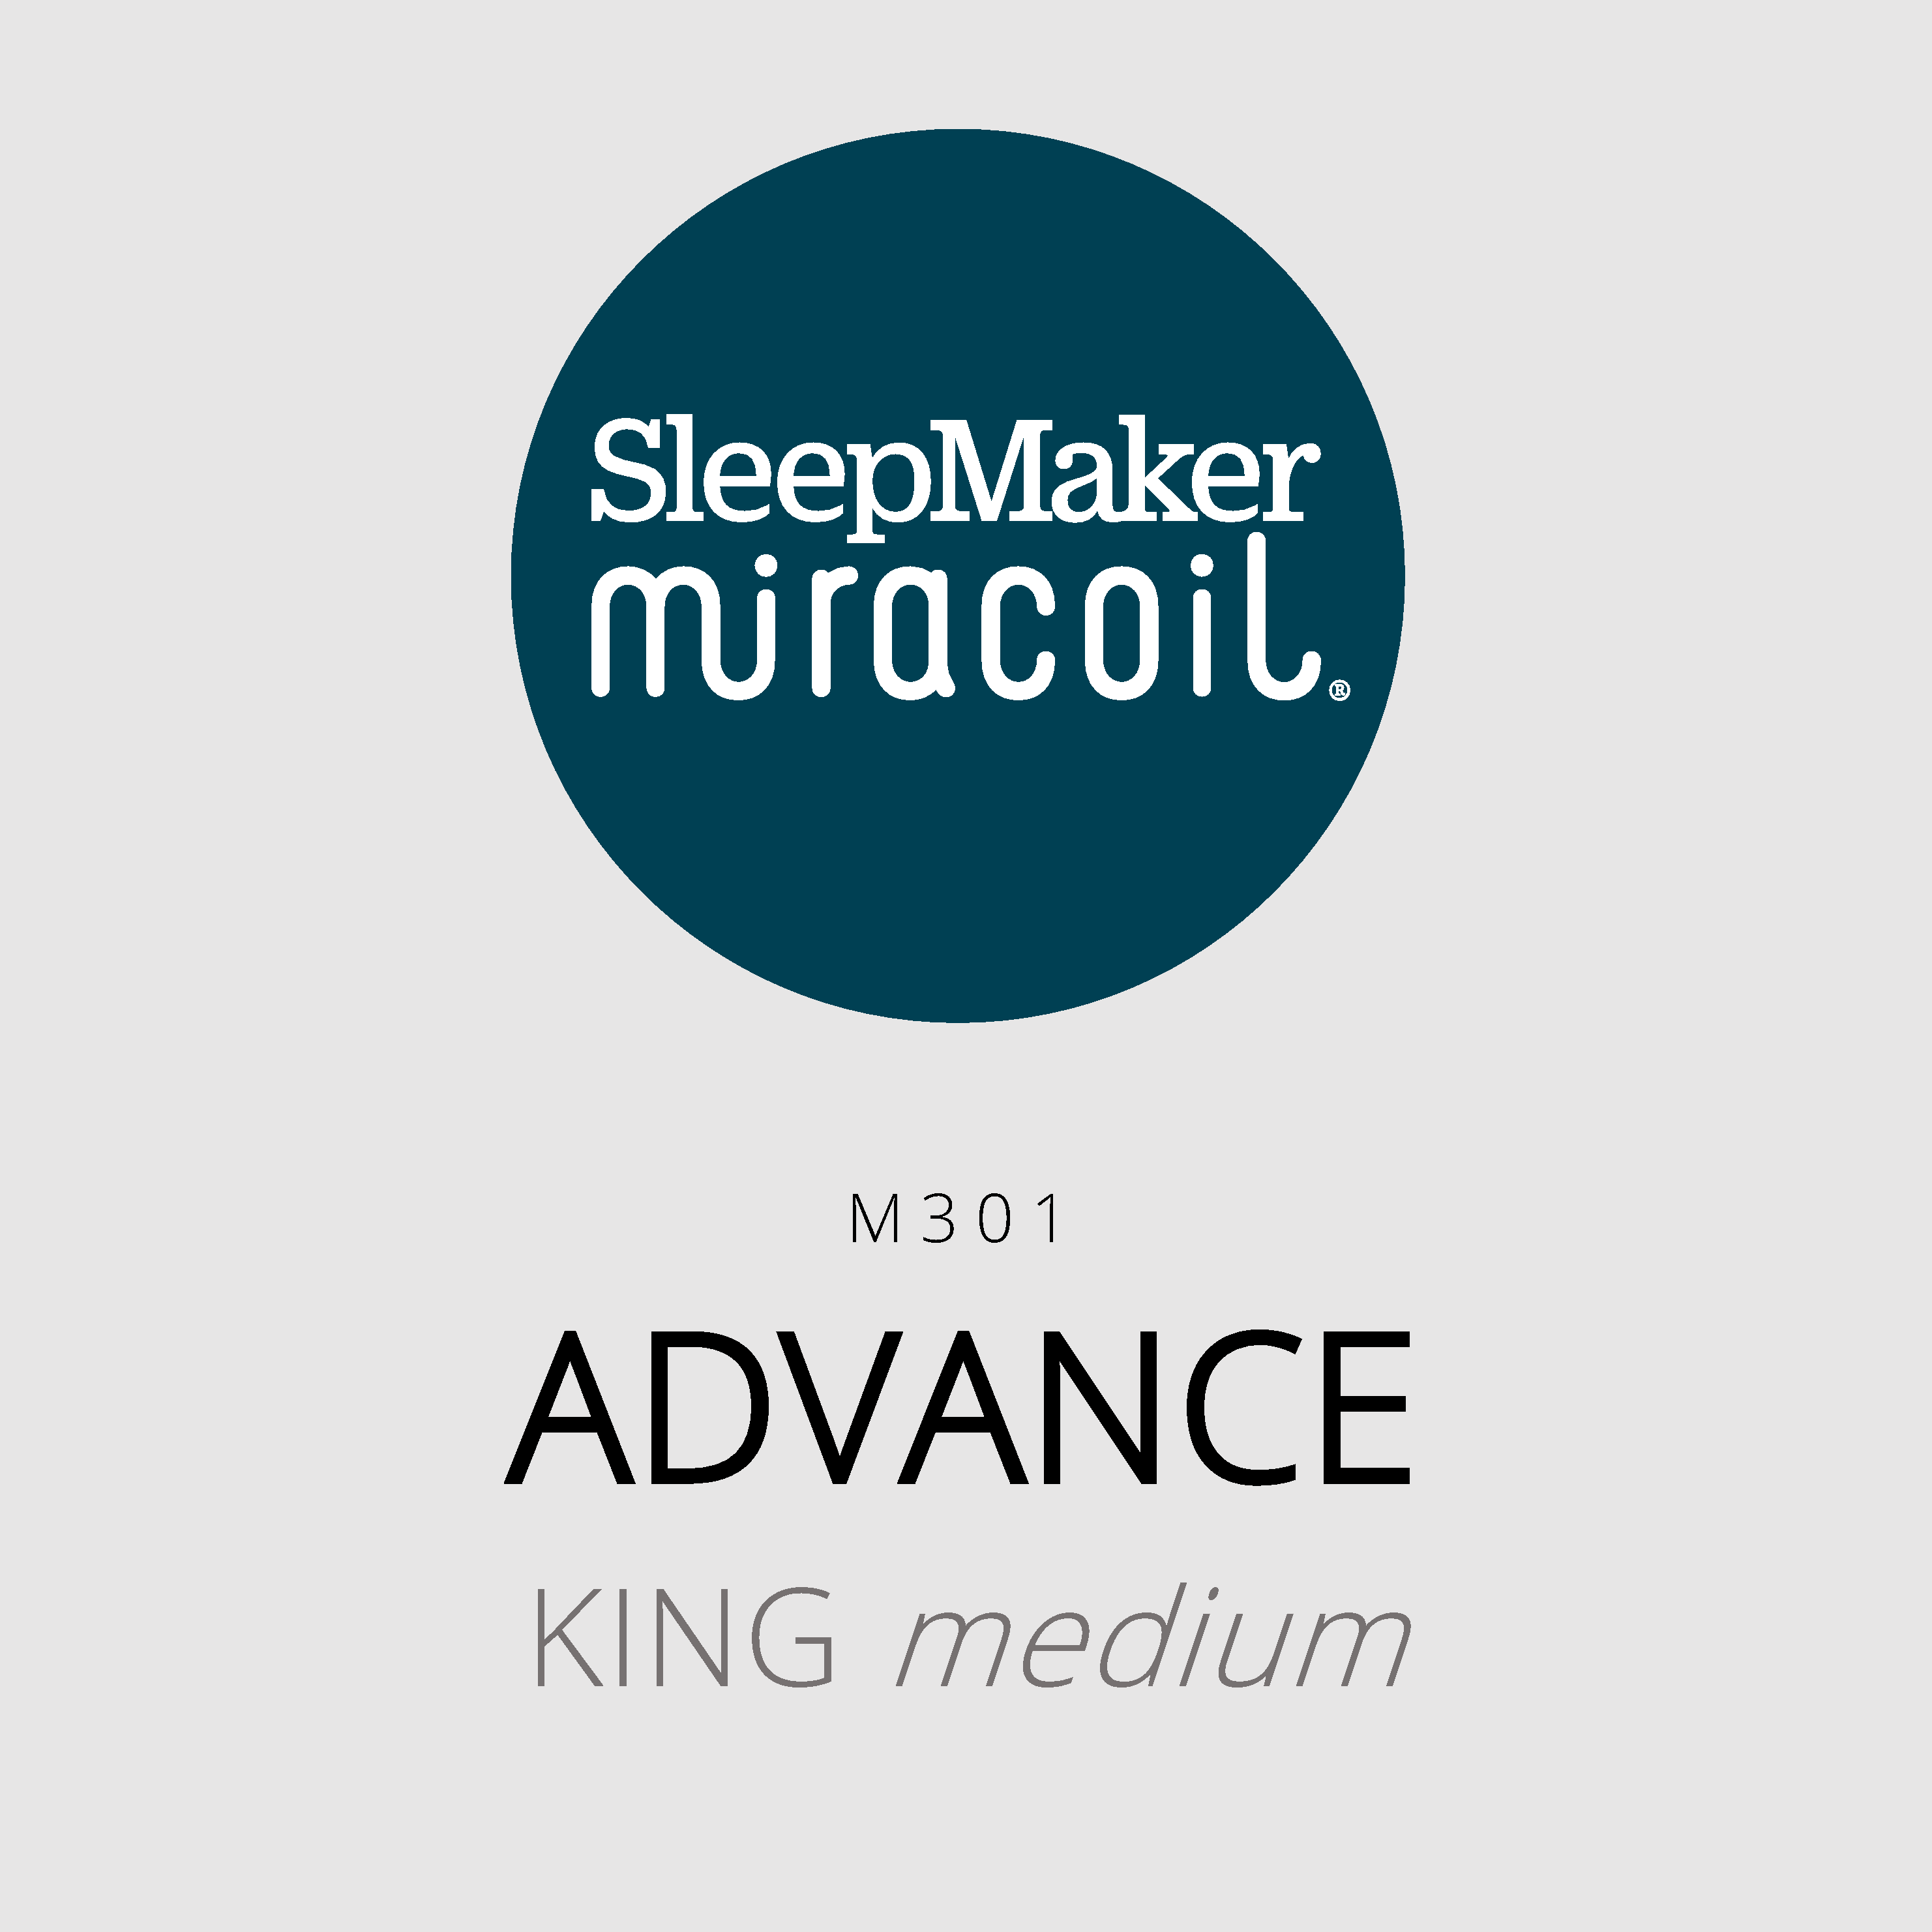 SleepMaker Miracoil – Advance – M301 – King Medium Mattress